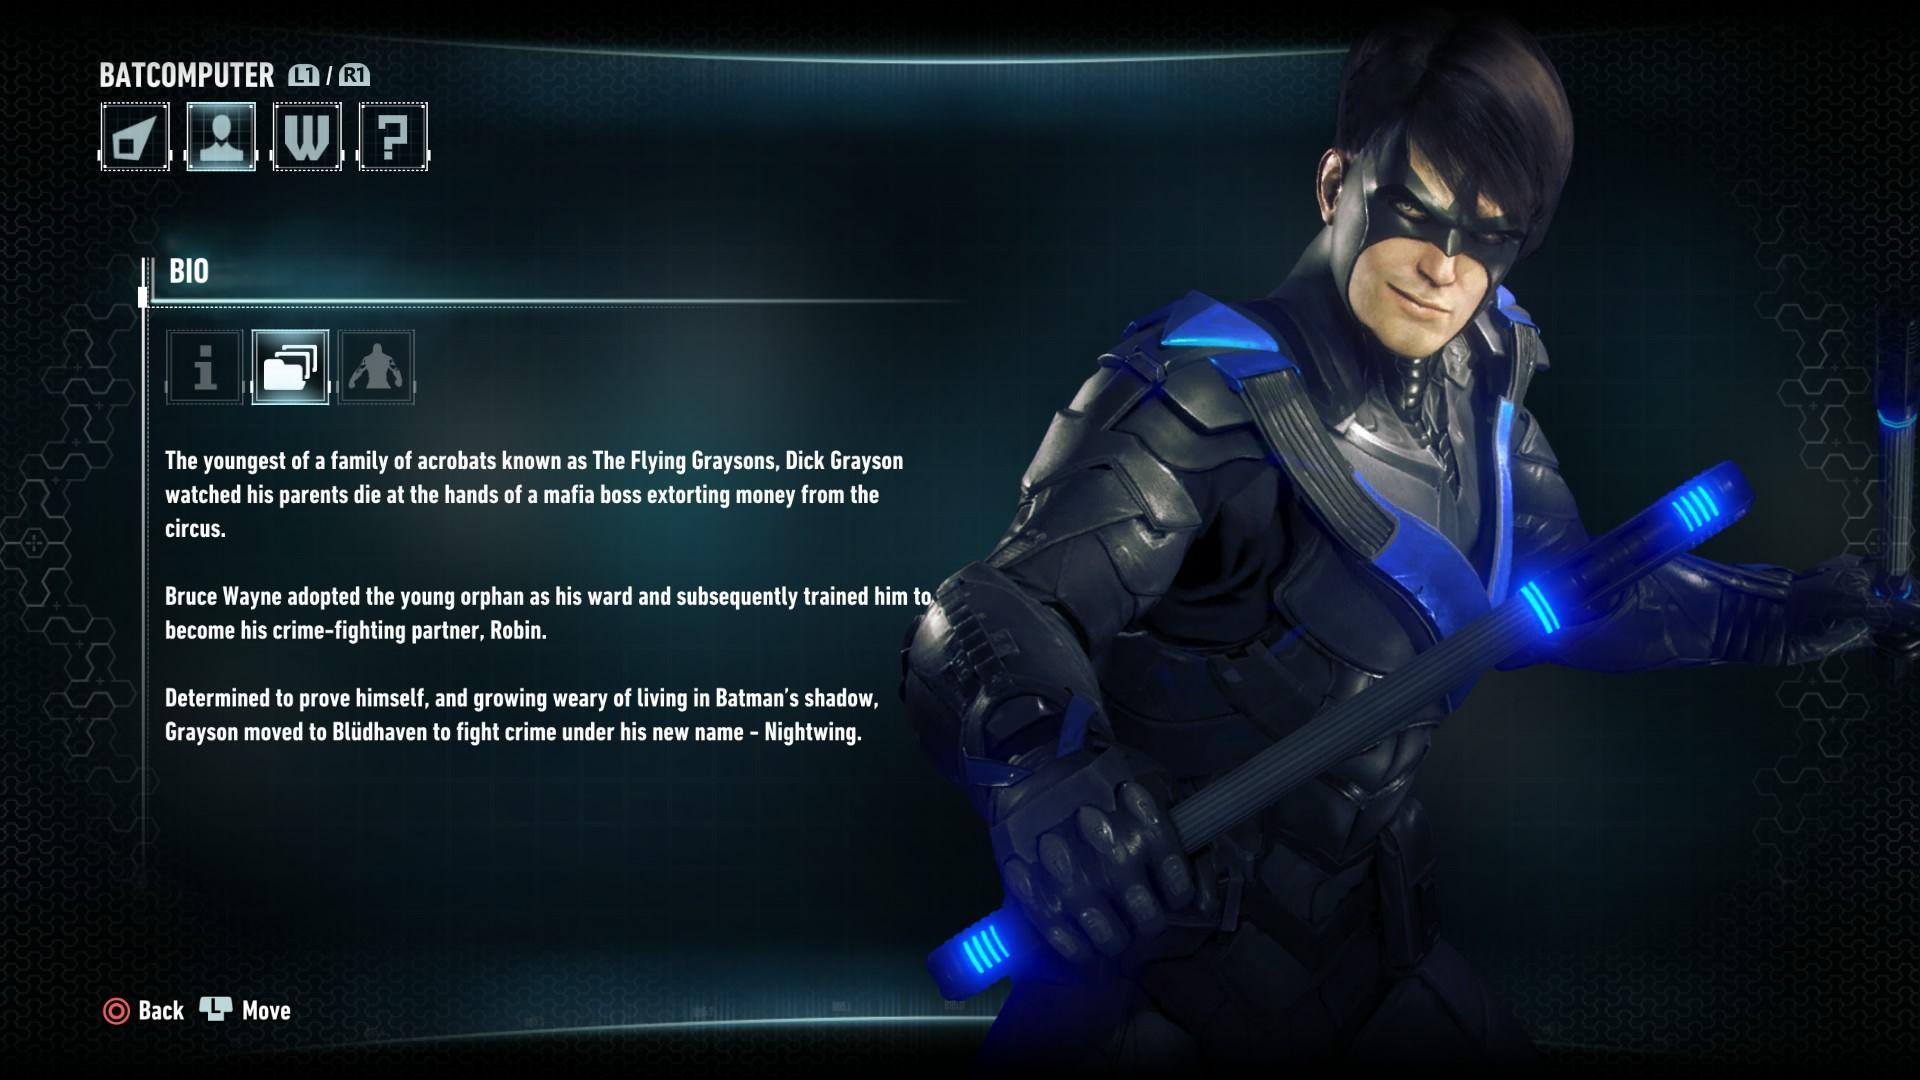 Nightwing bio nightwing arkham knight character arkham